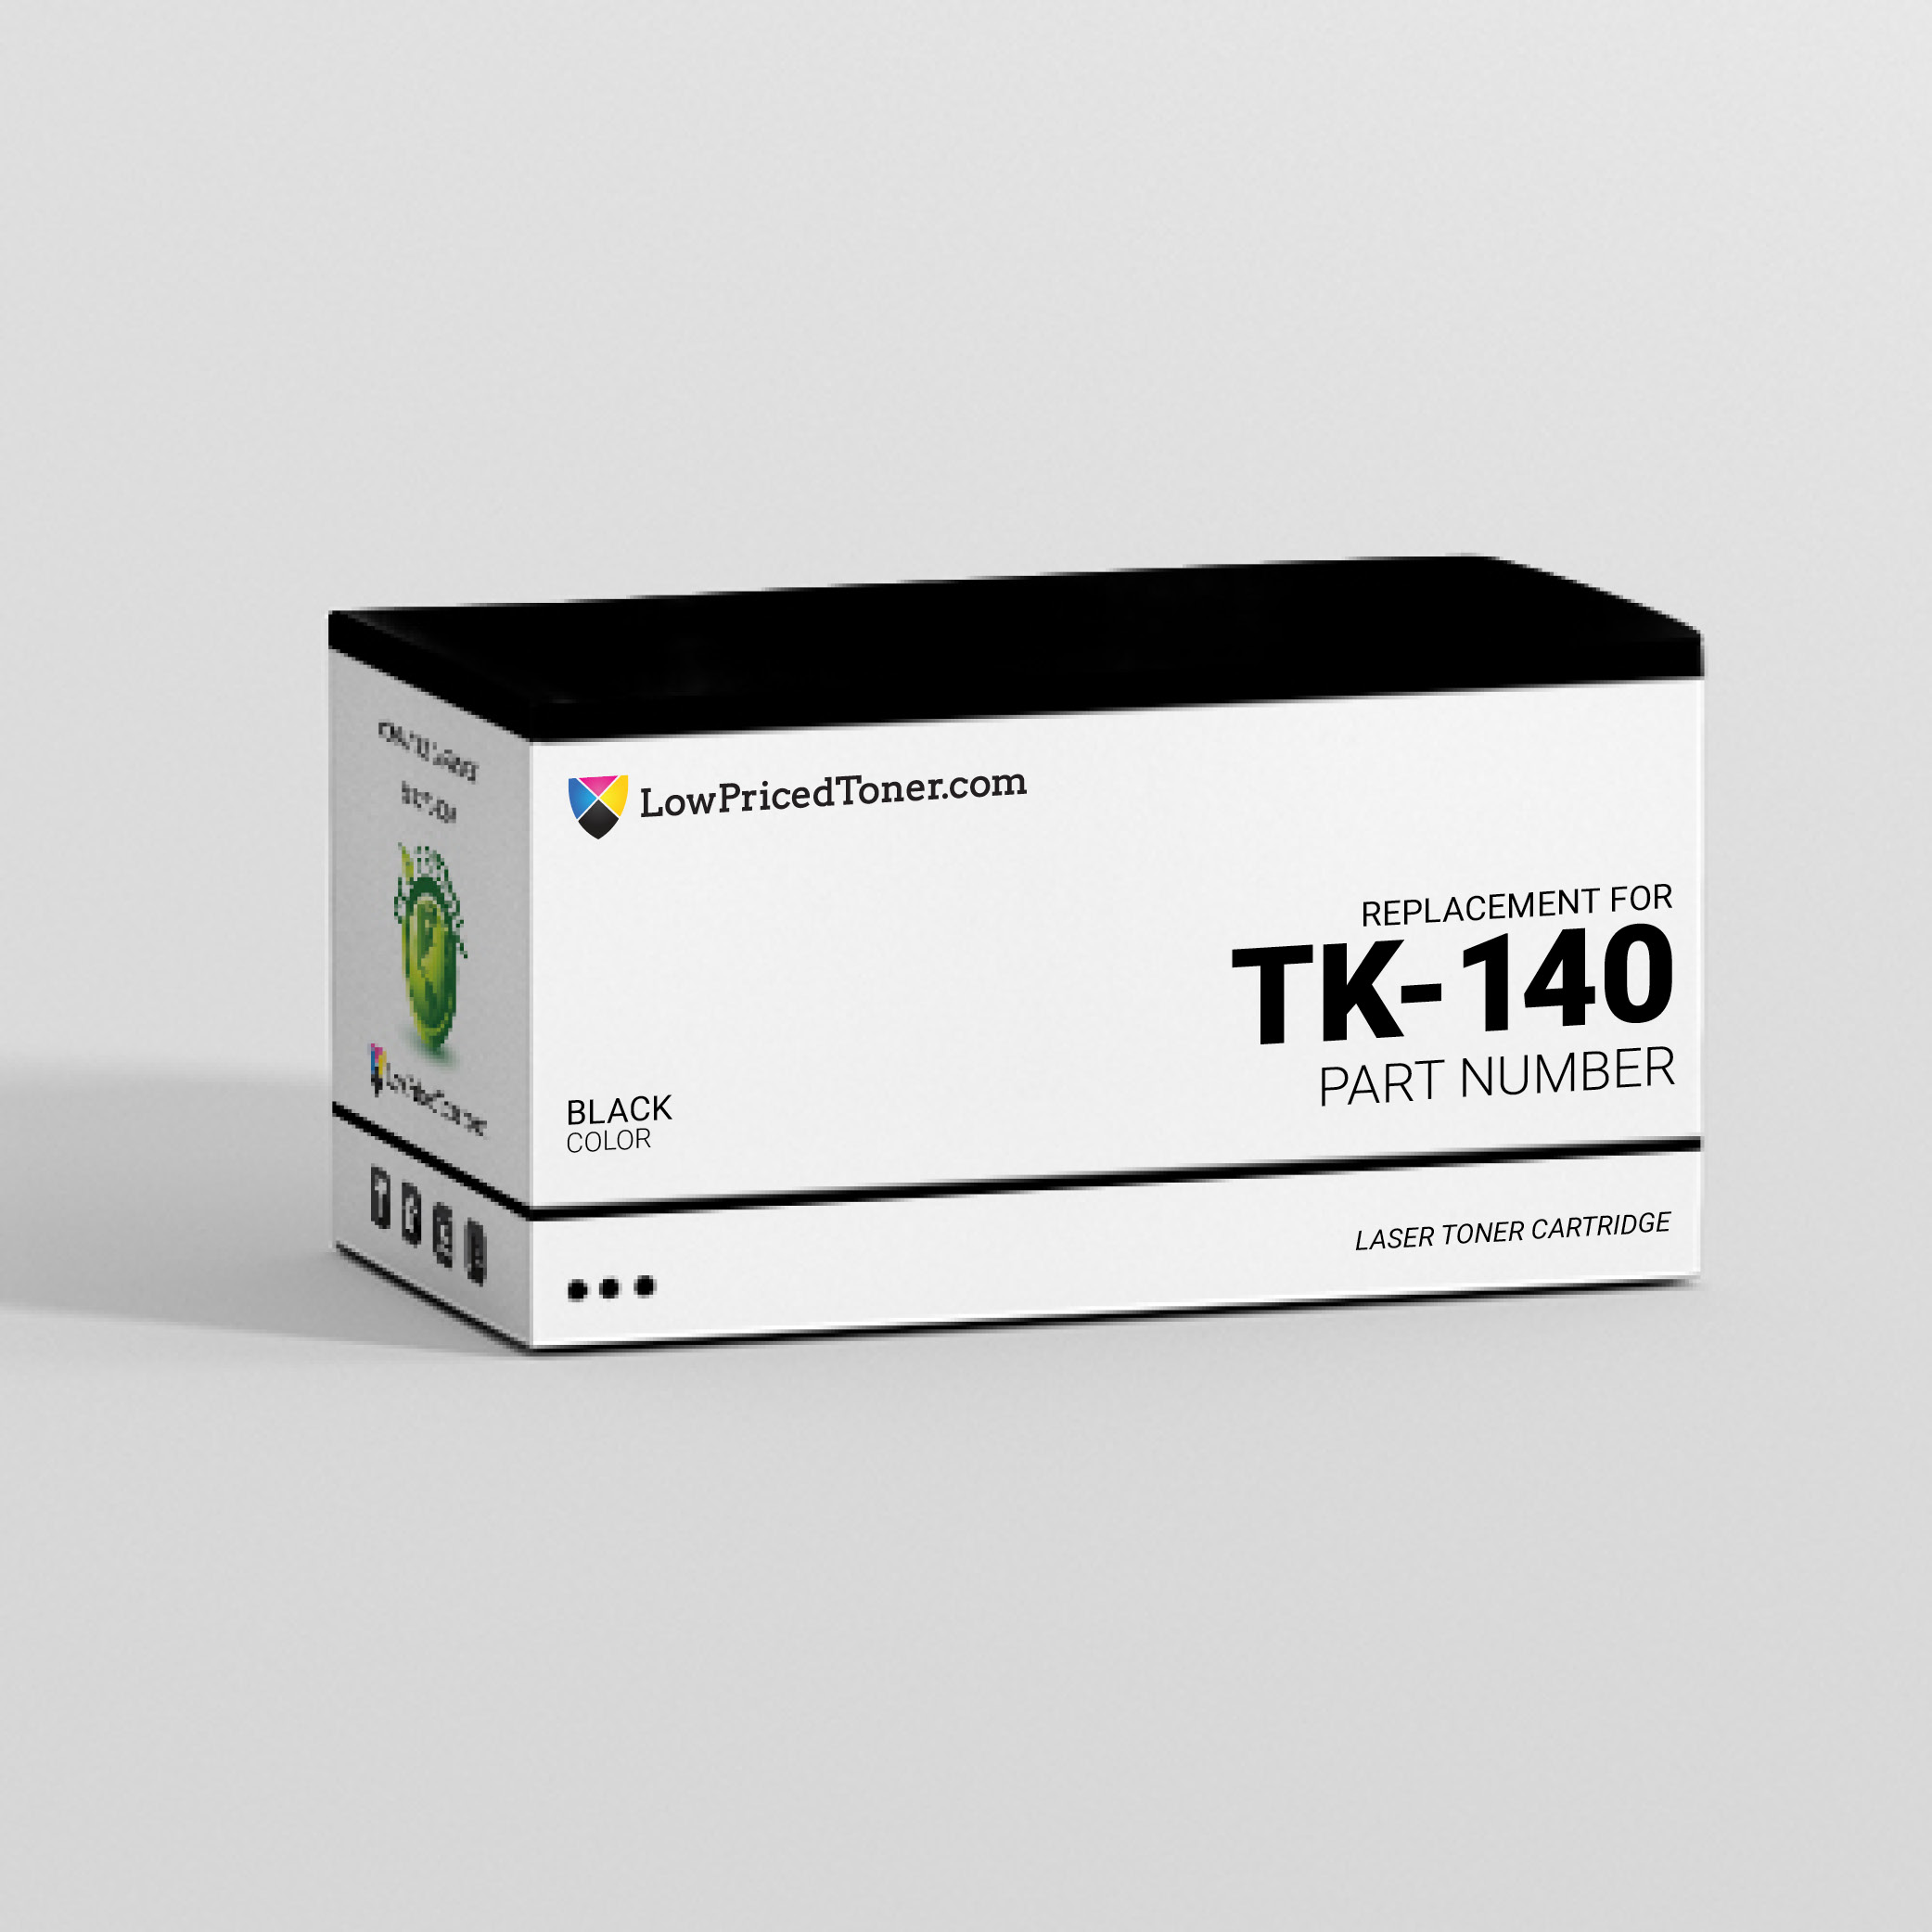 Kyocera Mita TK-140 Compatible Black Laser Toner Cartridge